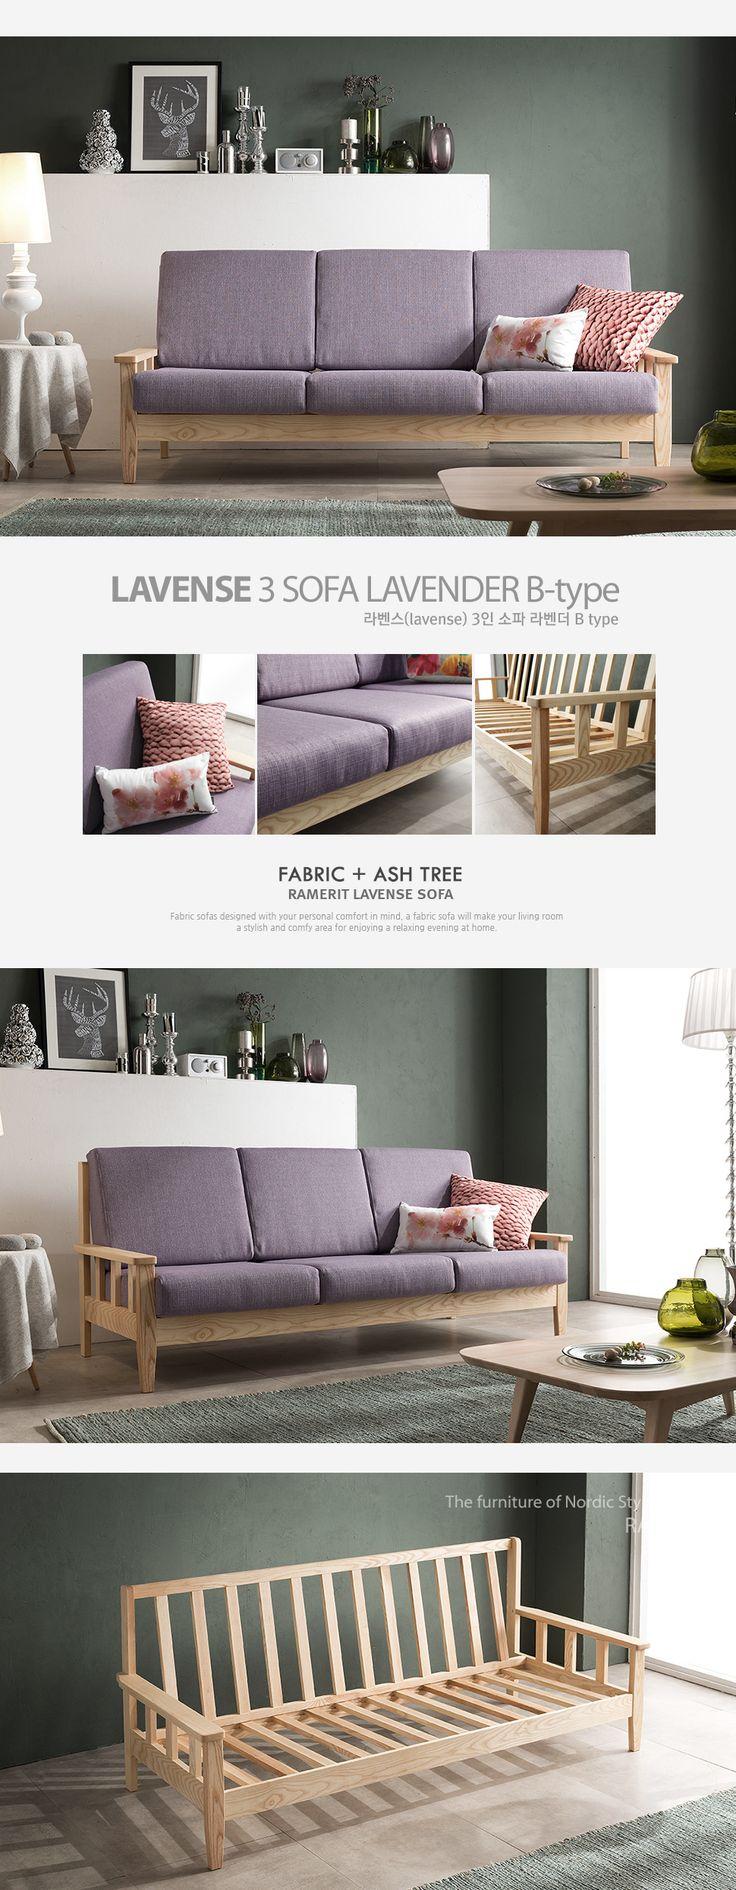 [Ramerit] Fabric & Ash Tree Sofa : LAVENSE 3 SOFA LAVENDER B-type